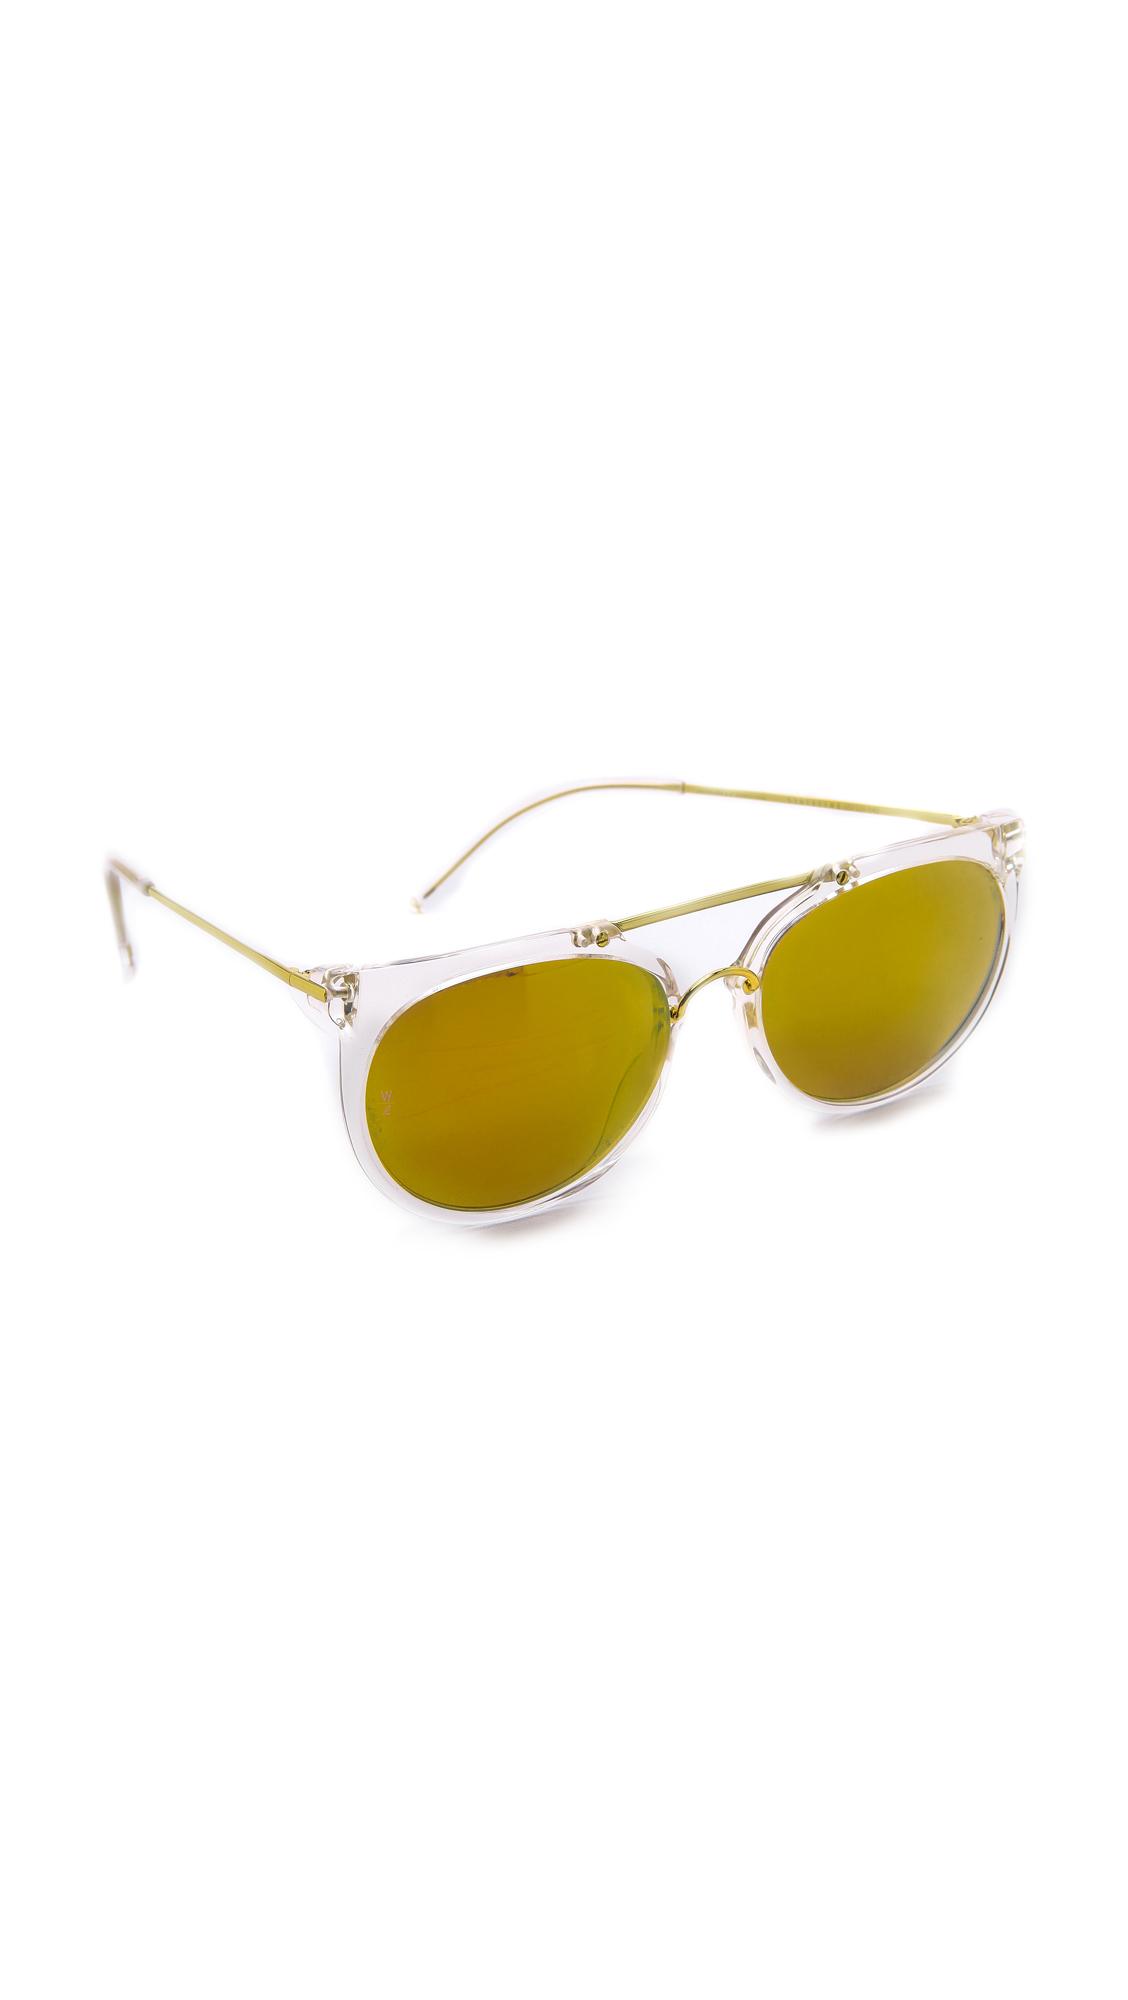 8f710b71a6173 Lyst - Wonderland Stateline Sunglasses - Clear gold in Metallic